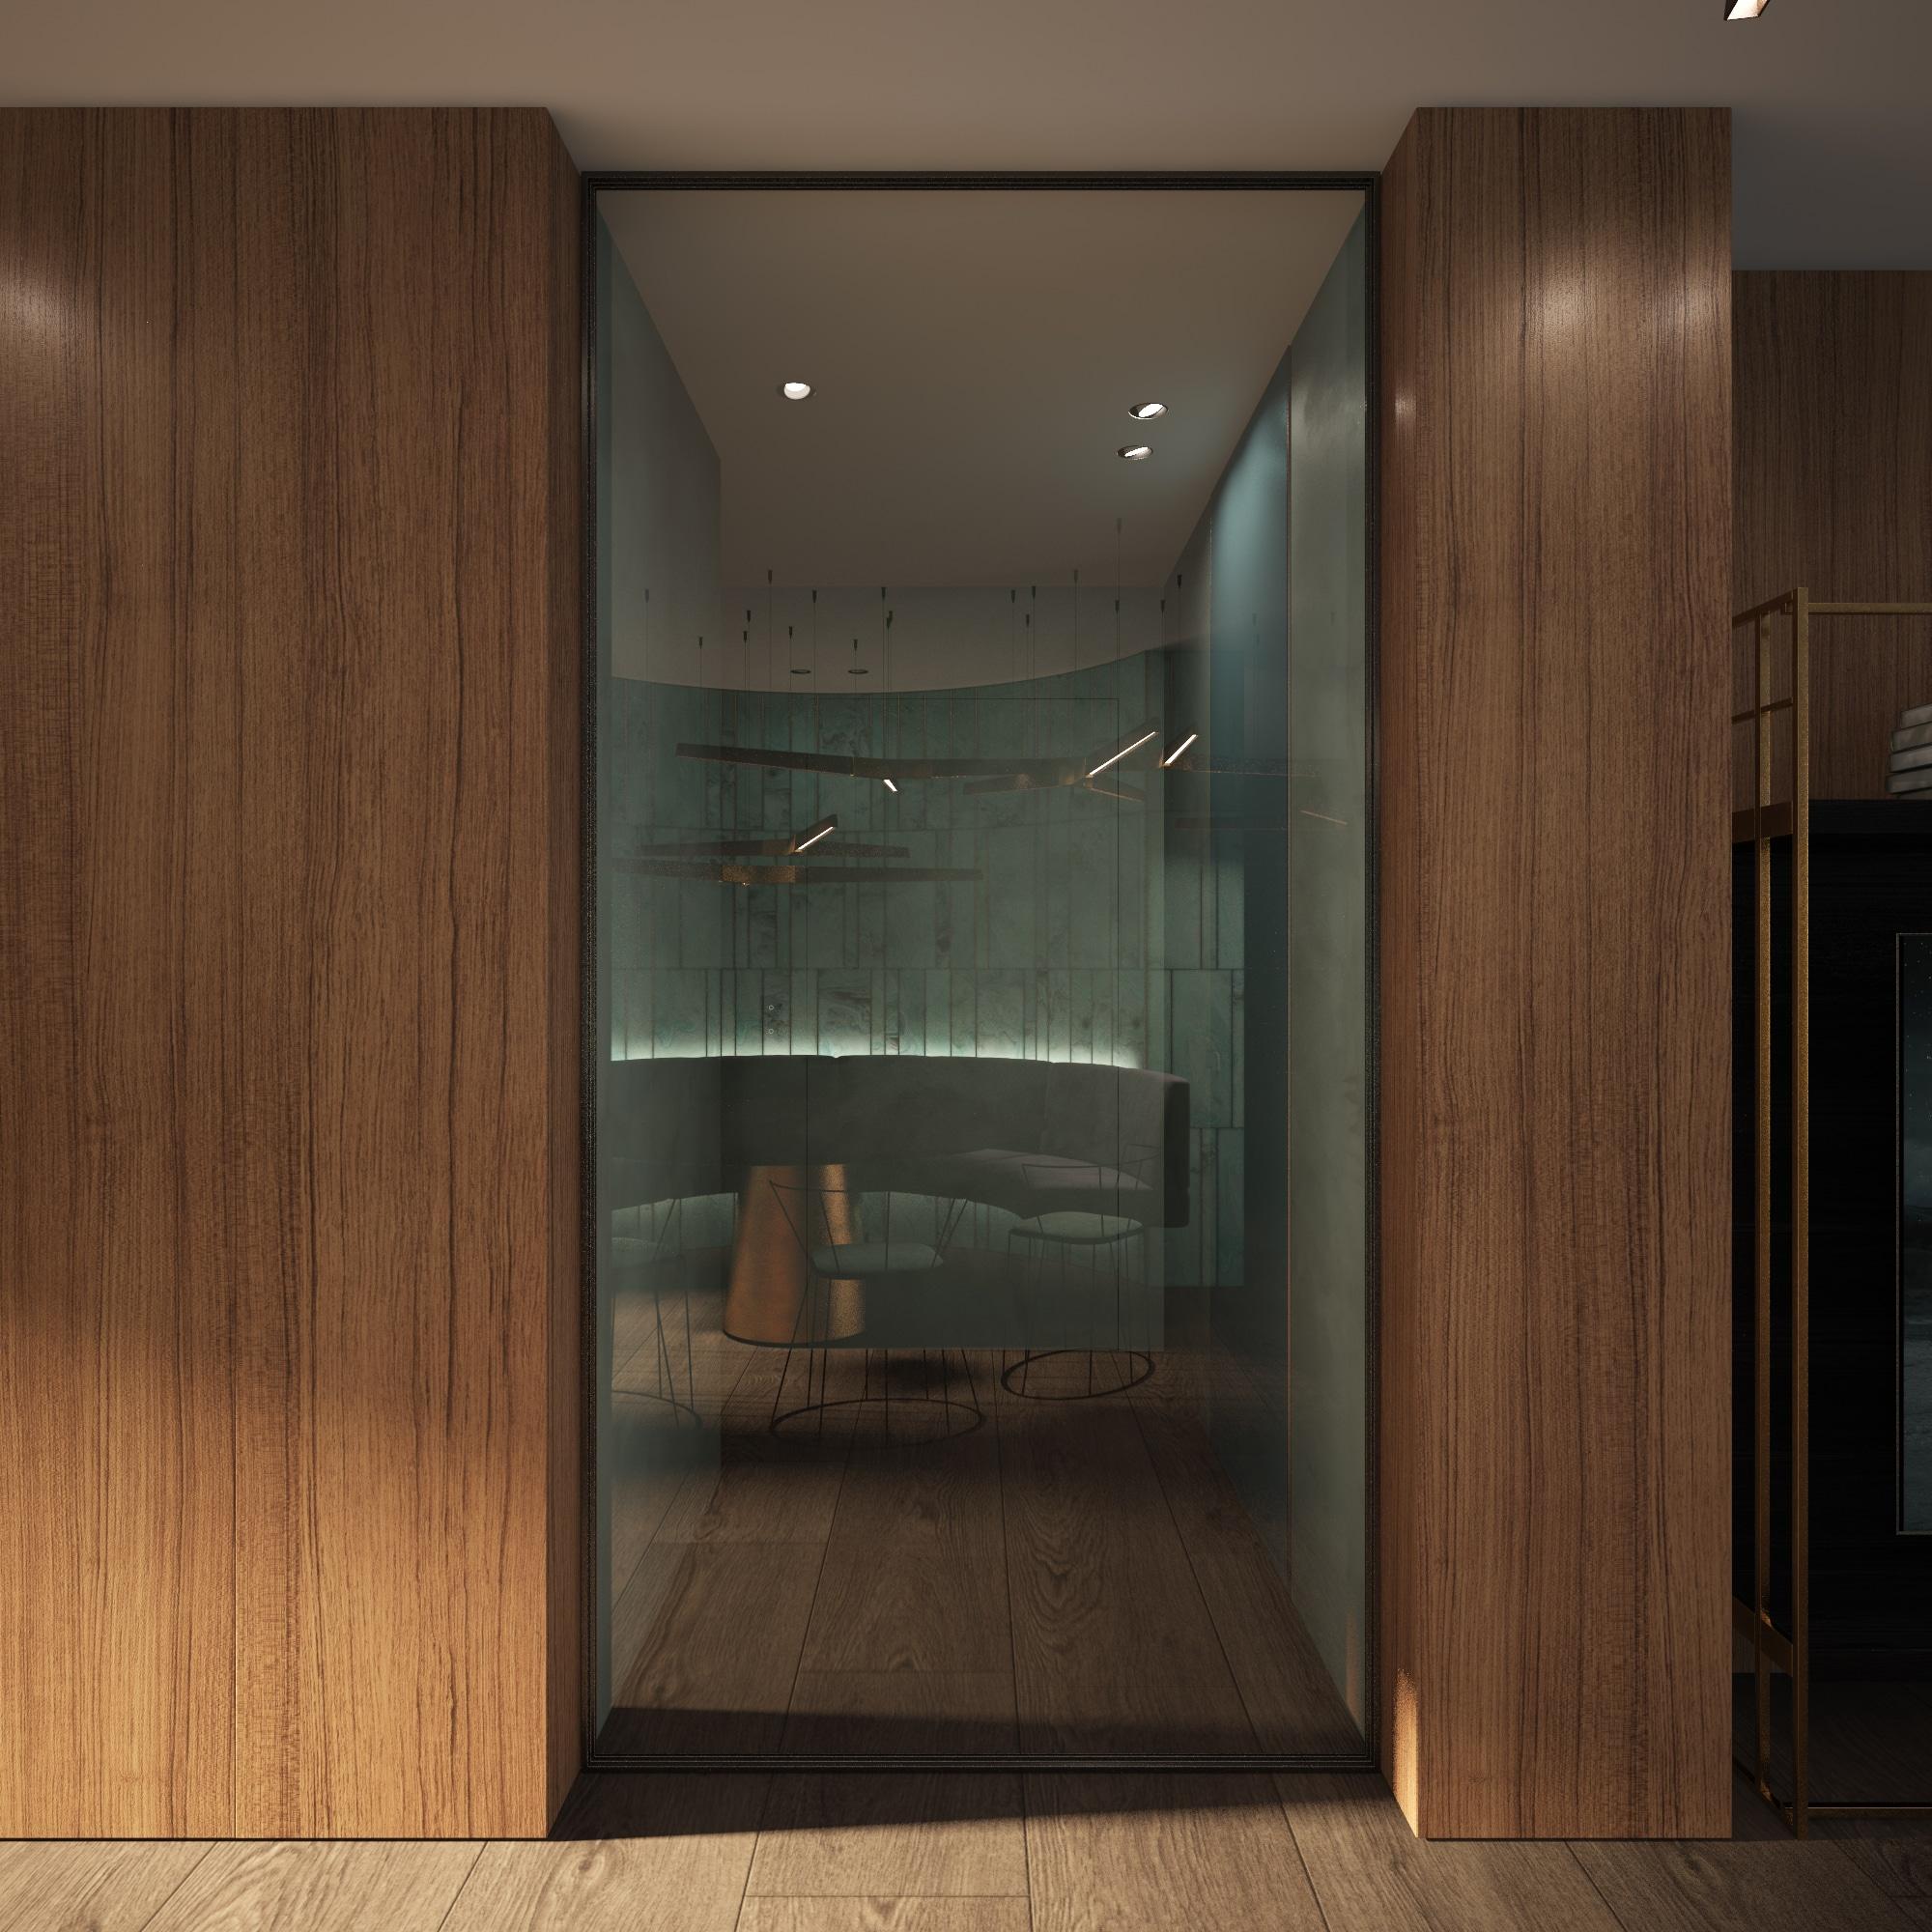 Hallway wall textures Dis Studio